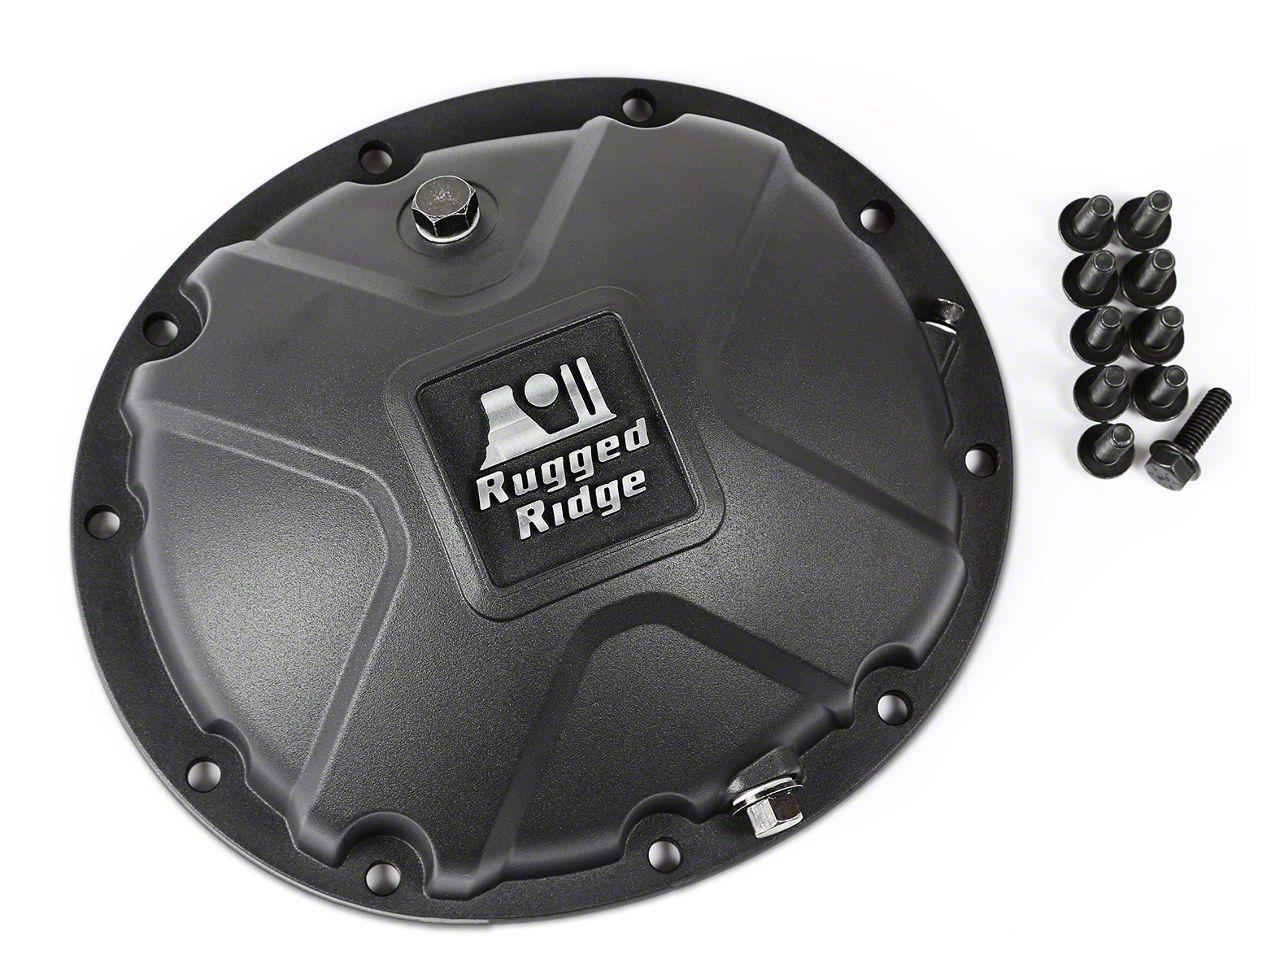 Rugged Ridge Dana 35 Boulder Aluminum Differential Cover - Black (87-06 Jeep Wrangler YJ & TJ)